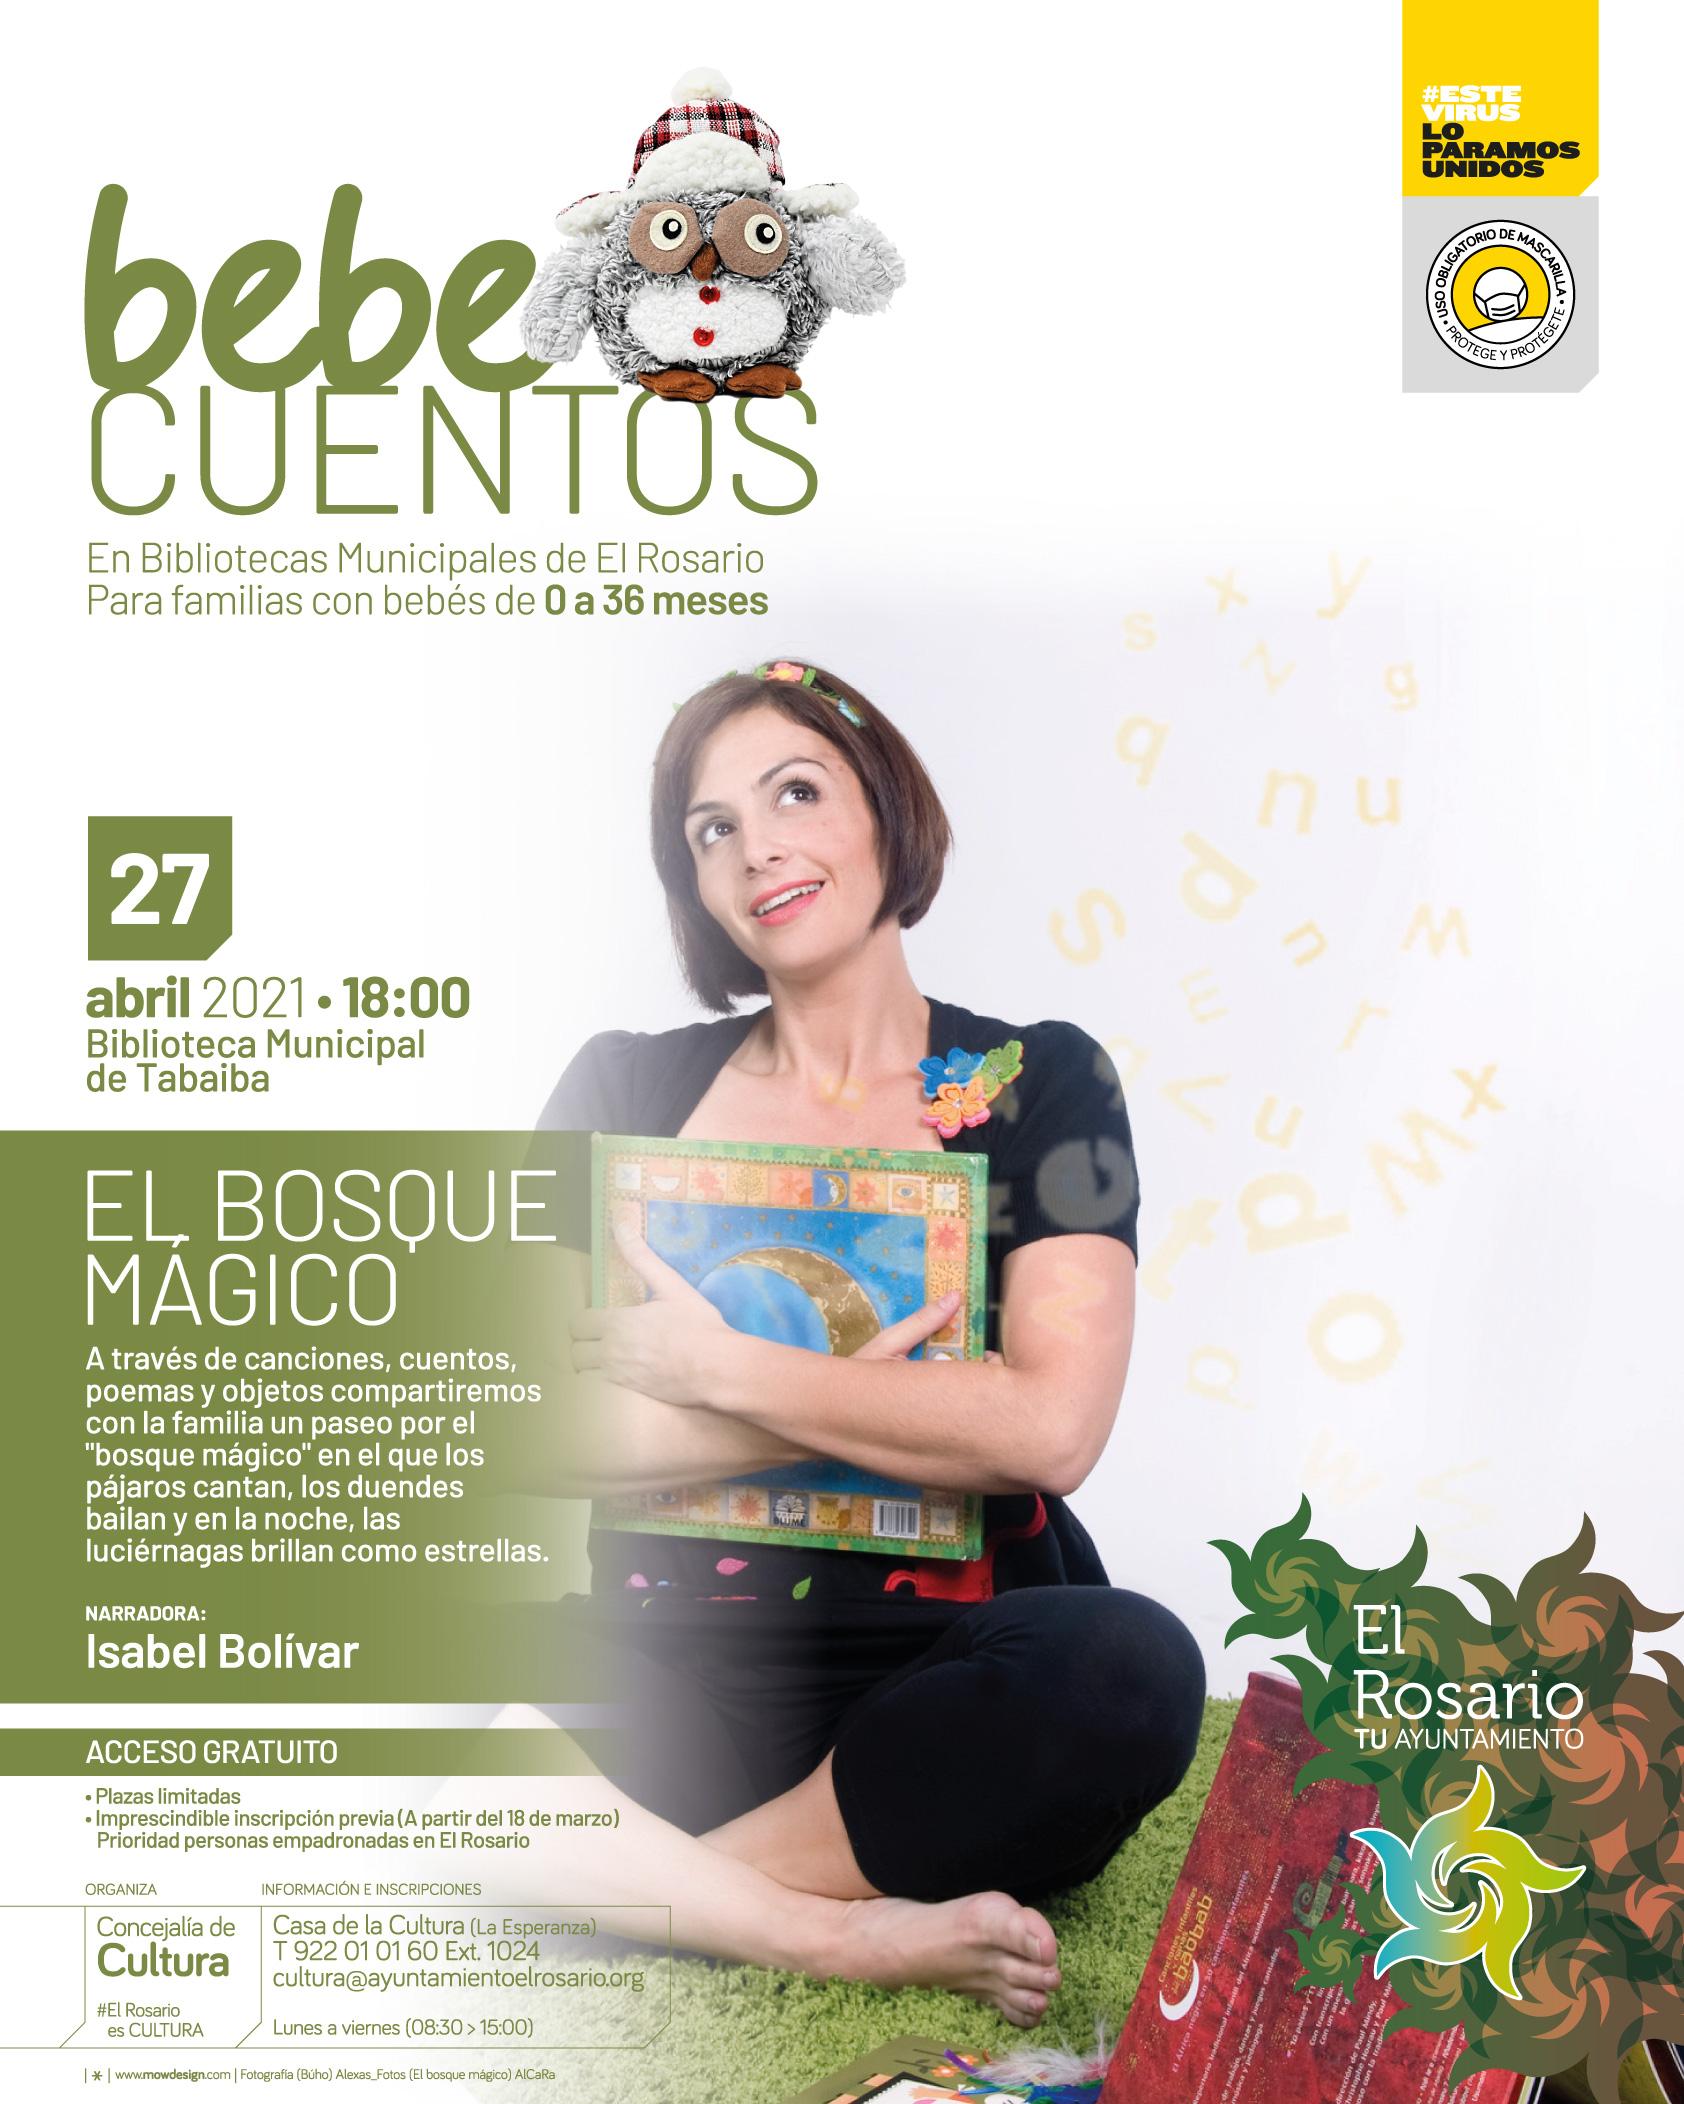 BEBECUENTOS-20210427-CARTEL_A3-20210412-01af-redes